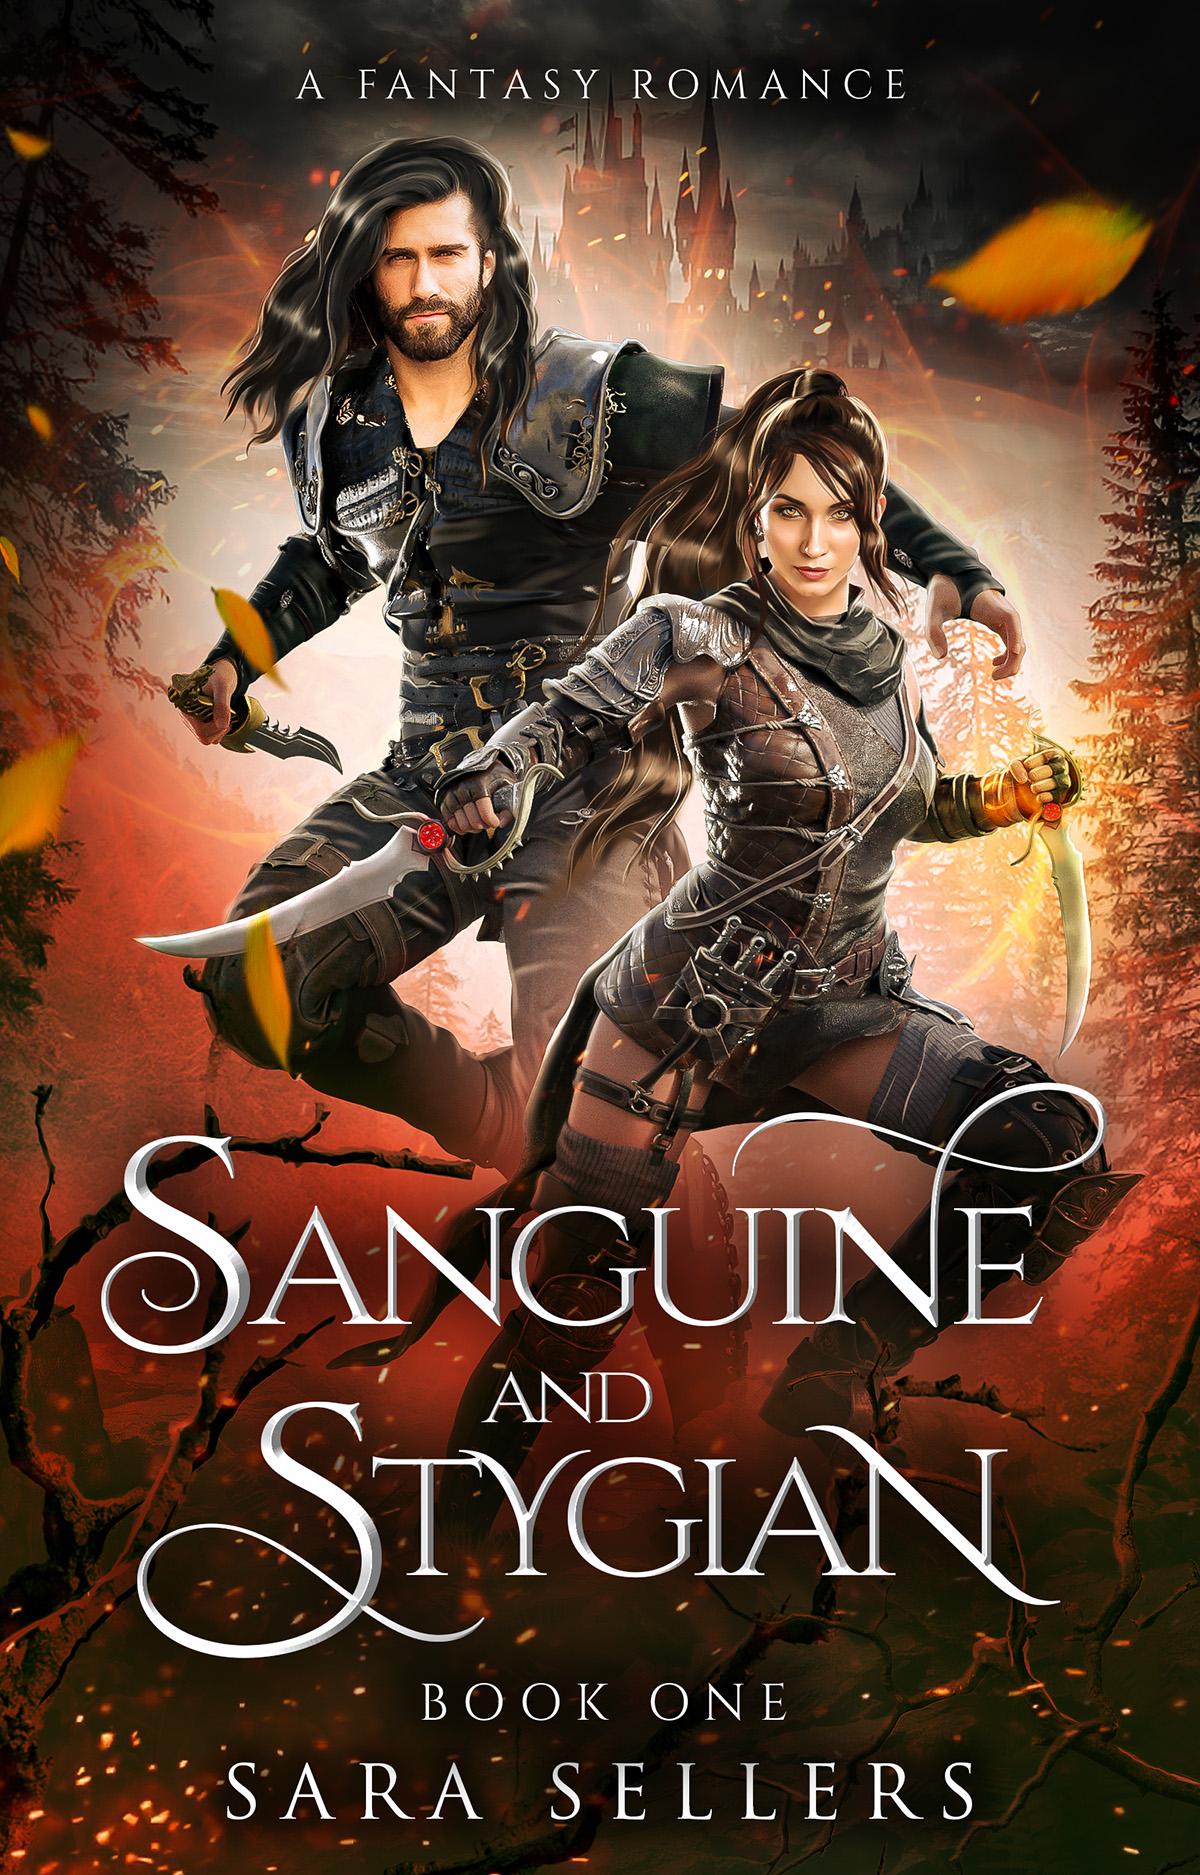 Sanguine and Stygian